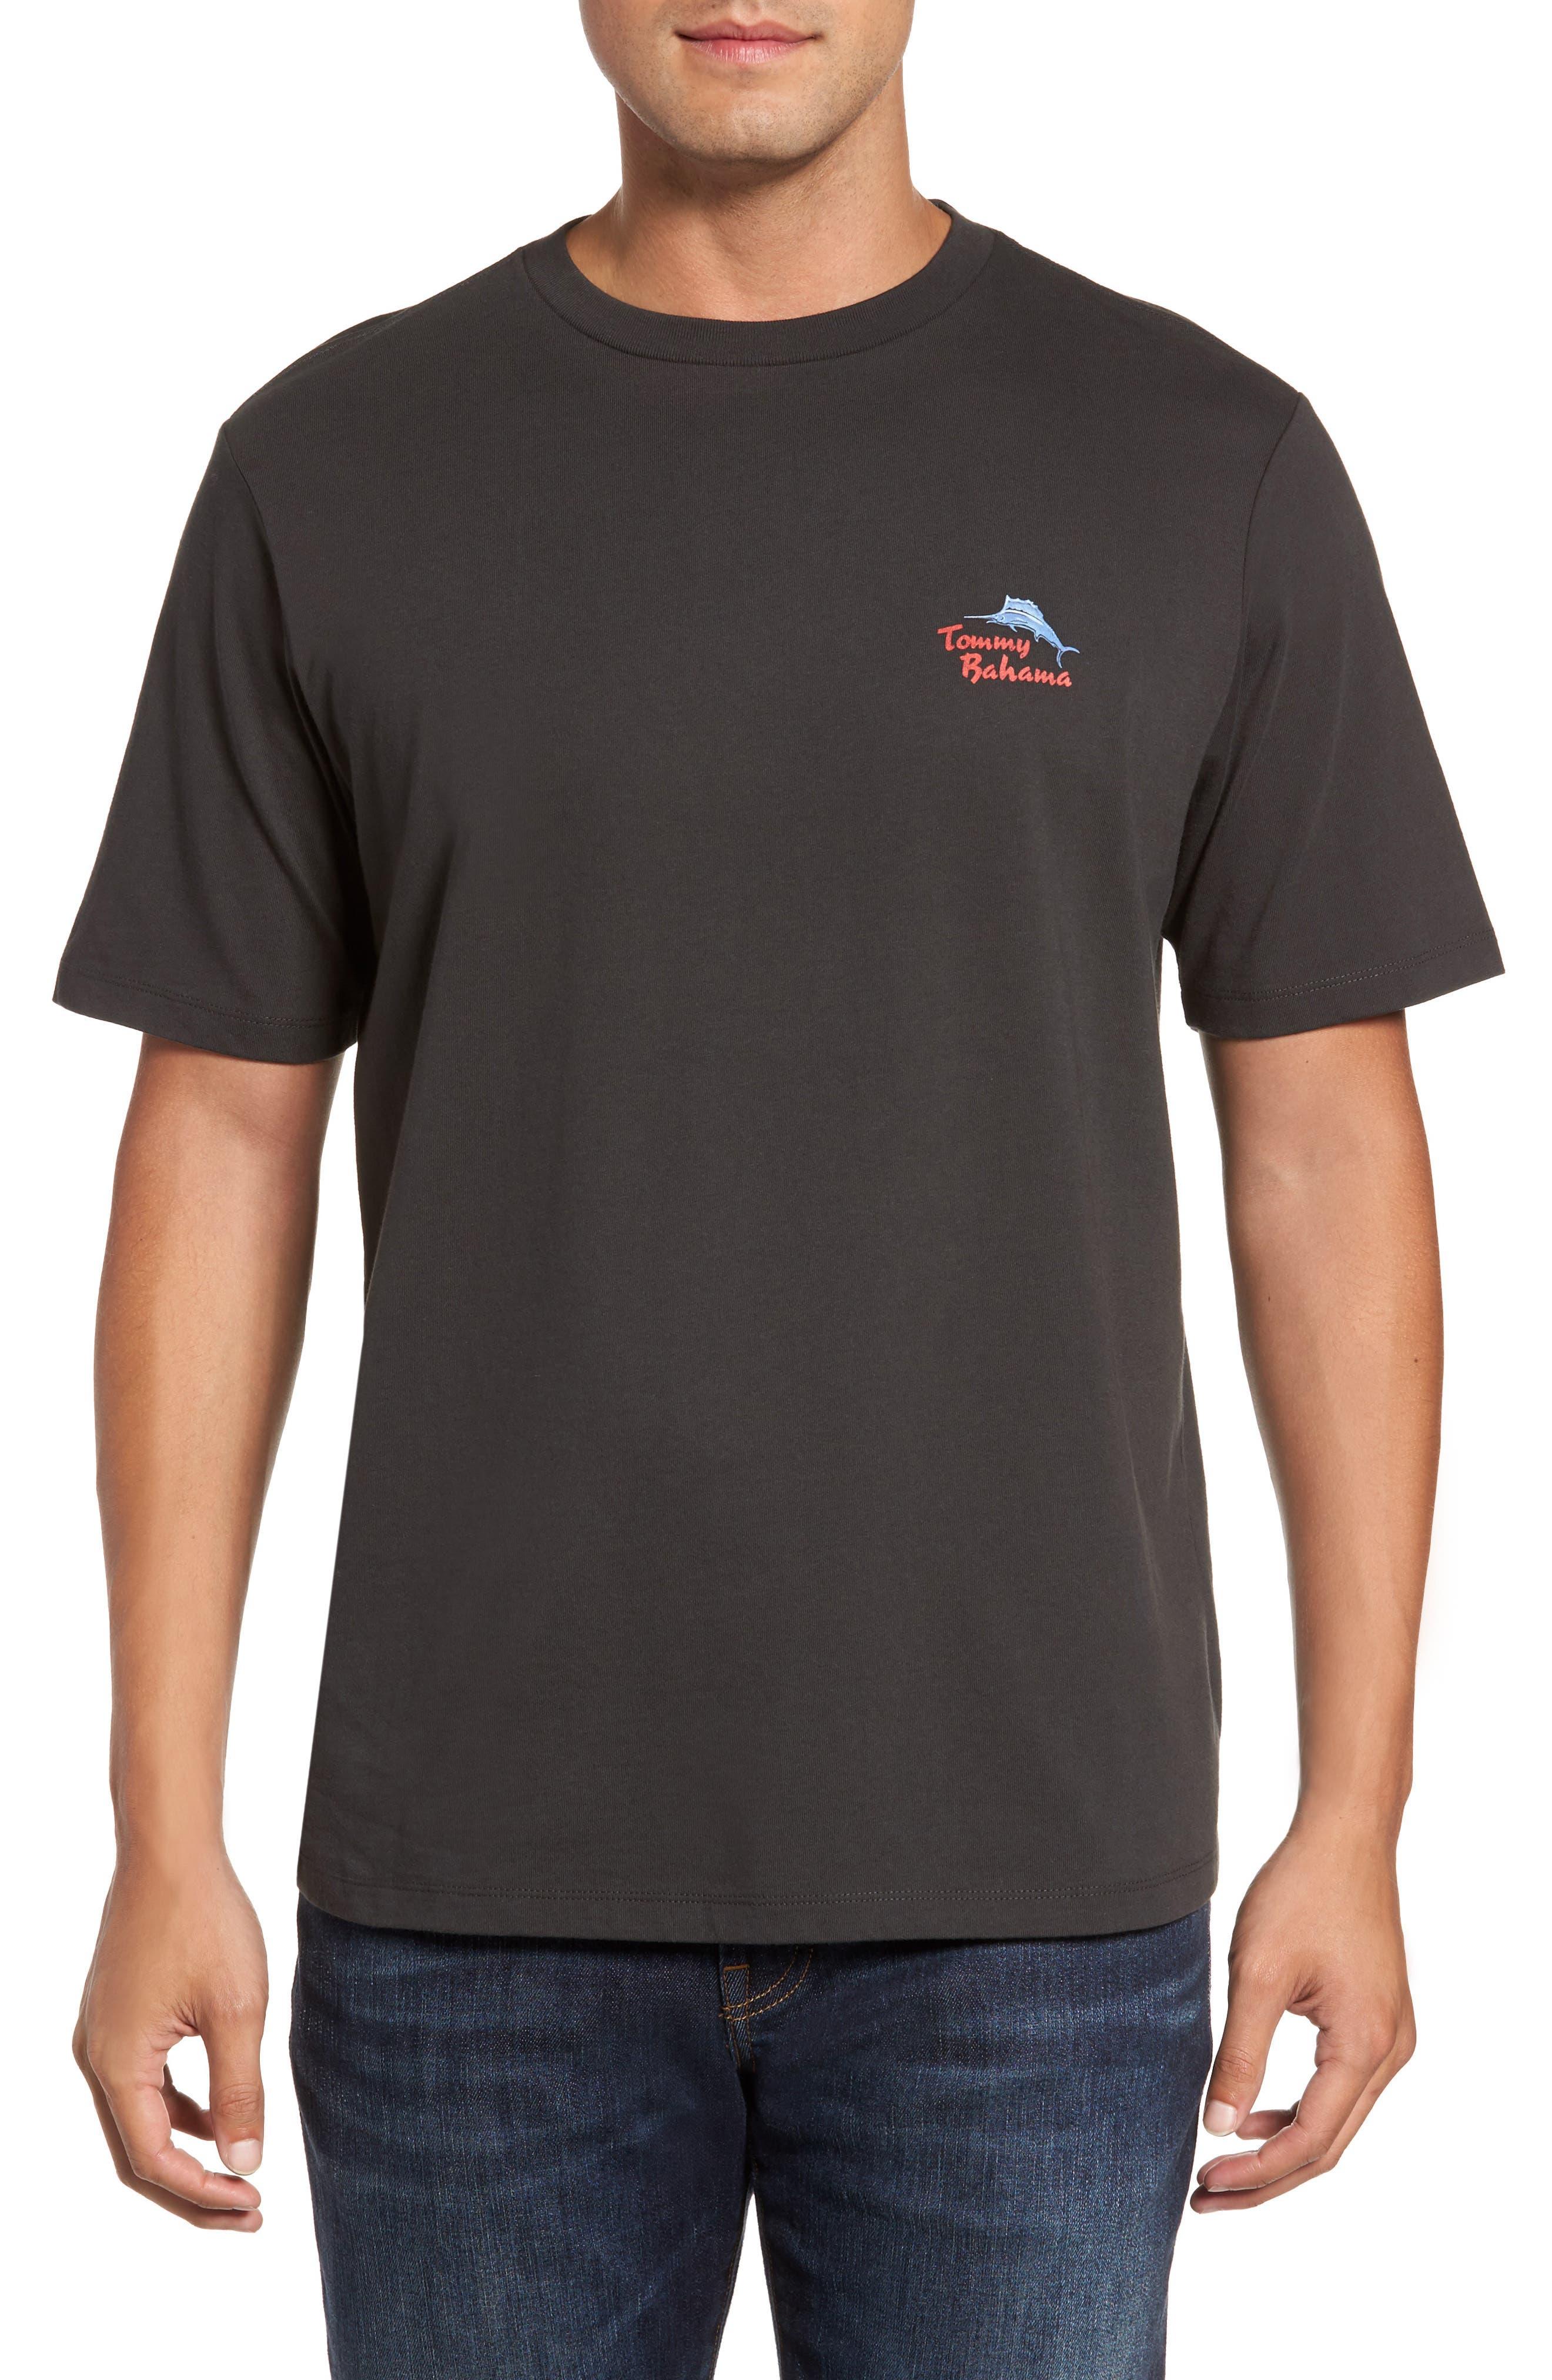 Gulp Fiction T-Shirt,                         Main,                         color, 001